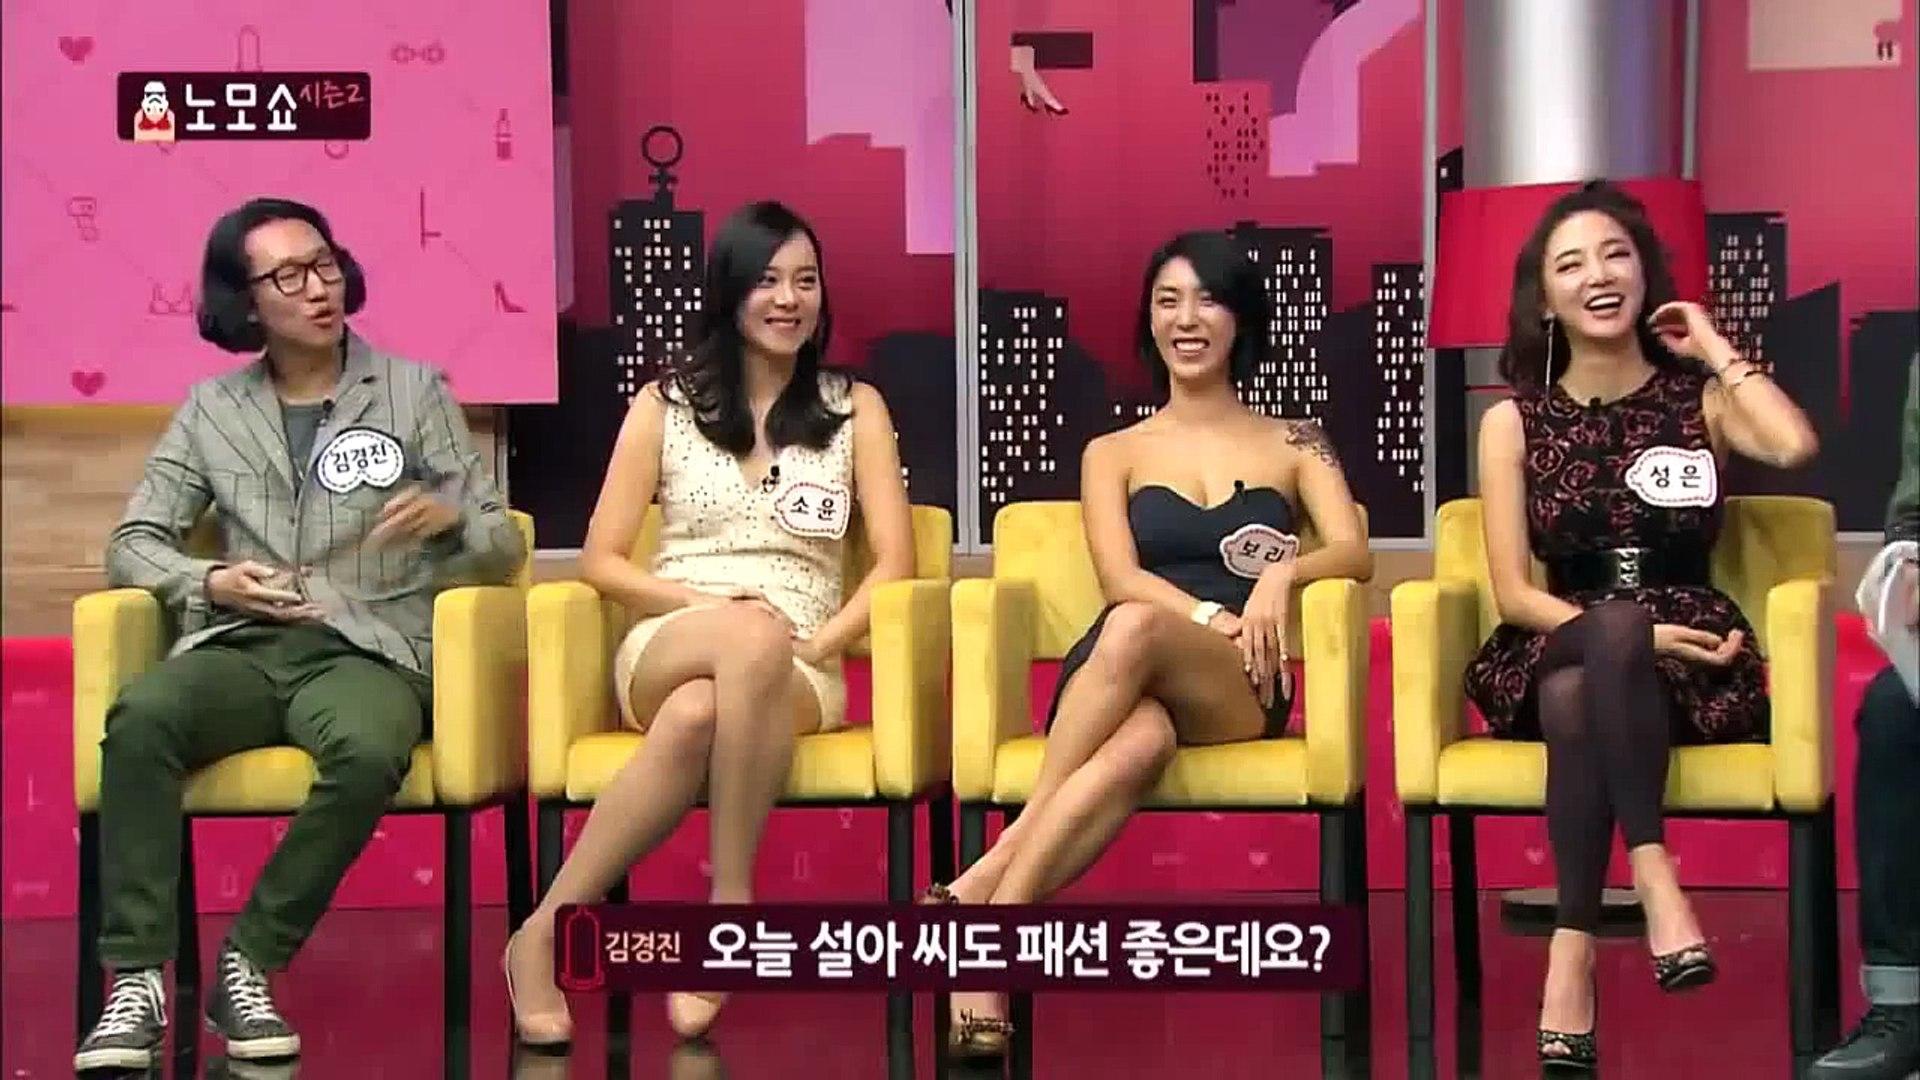 Game show japan + korea girl sexy || NO MORE SHOW SEXY GIRL ON GAME SHOW